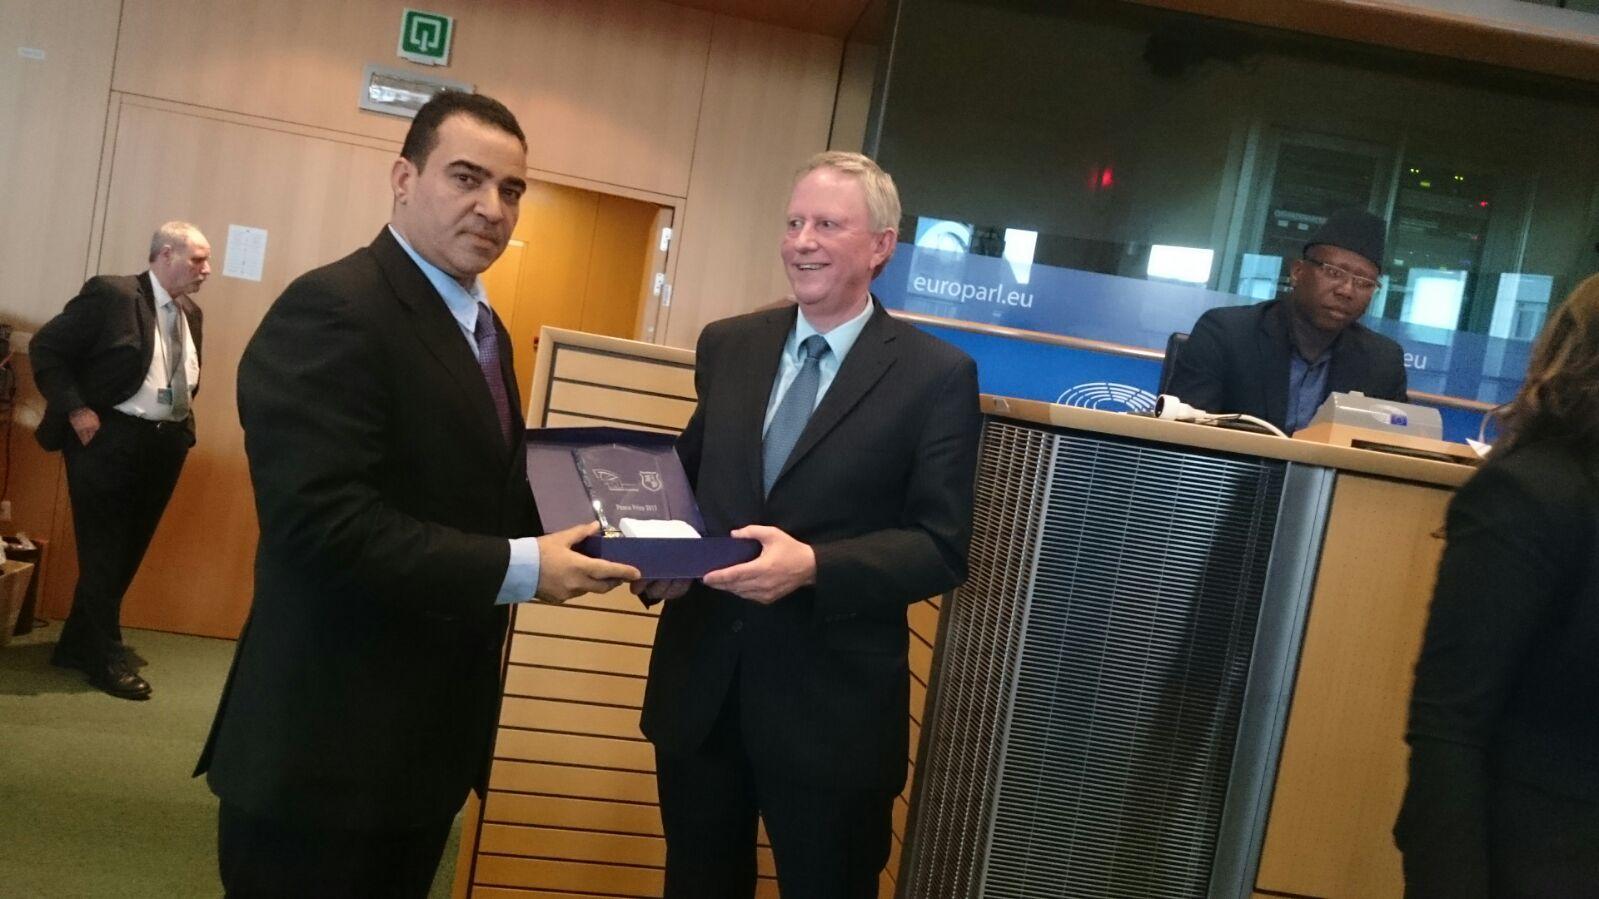 Dr. Bert de Ruiter (EEA Muslim Ministries) received a prize